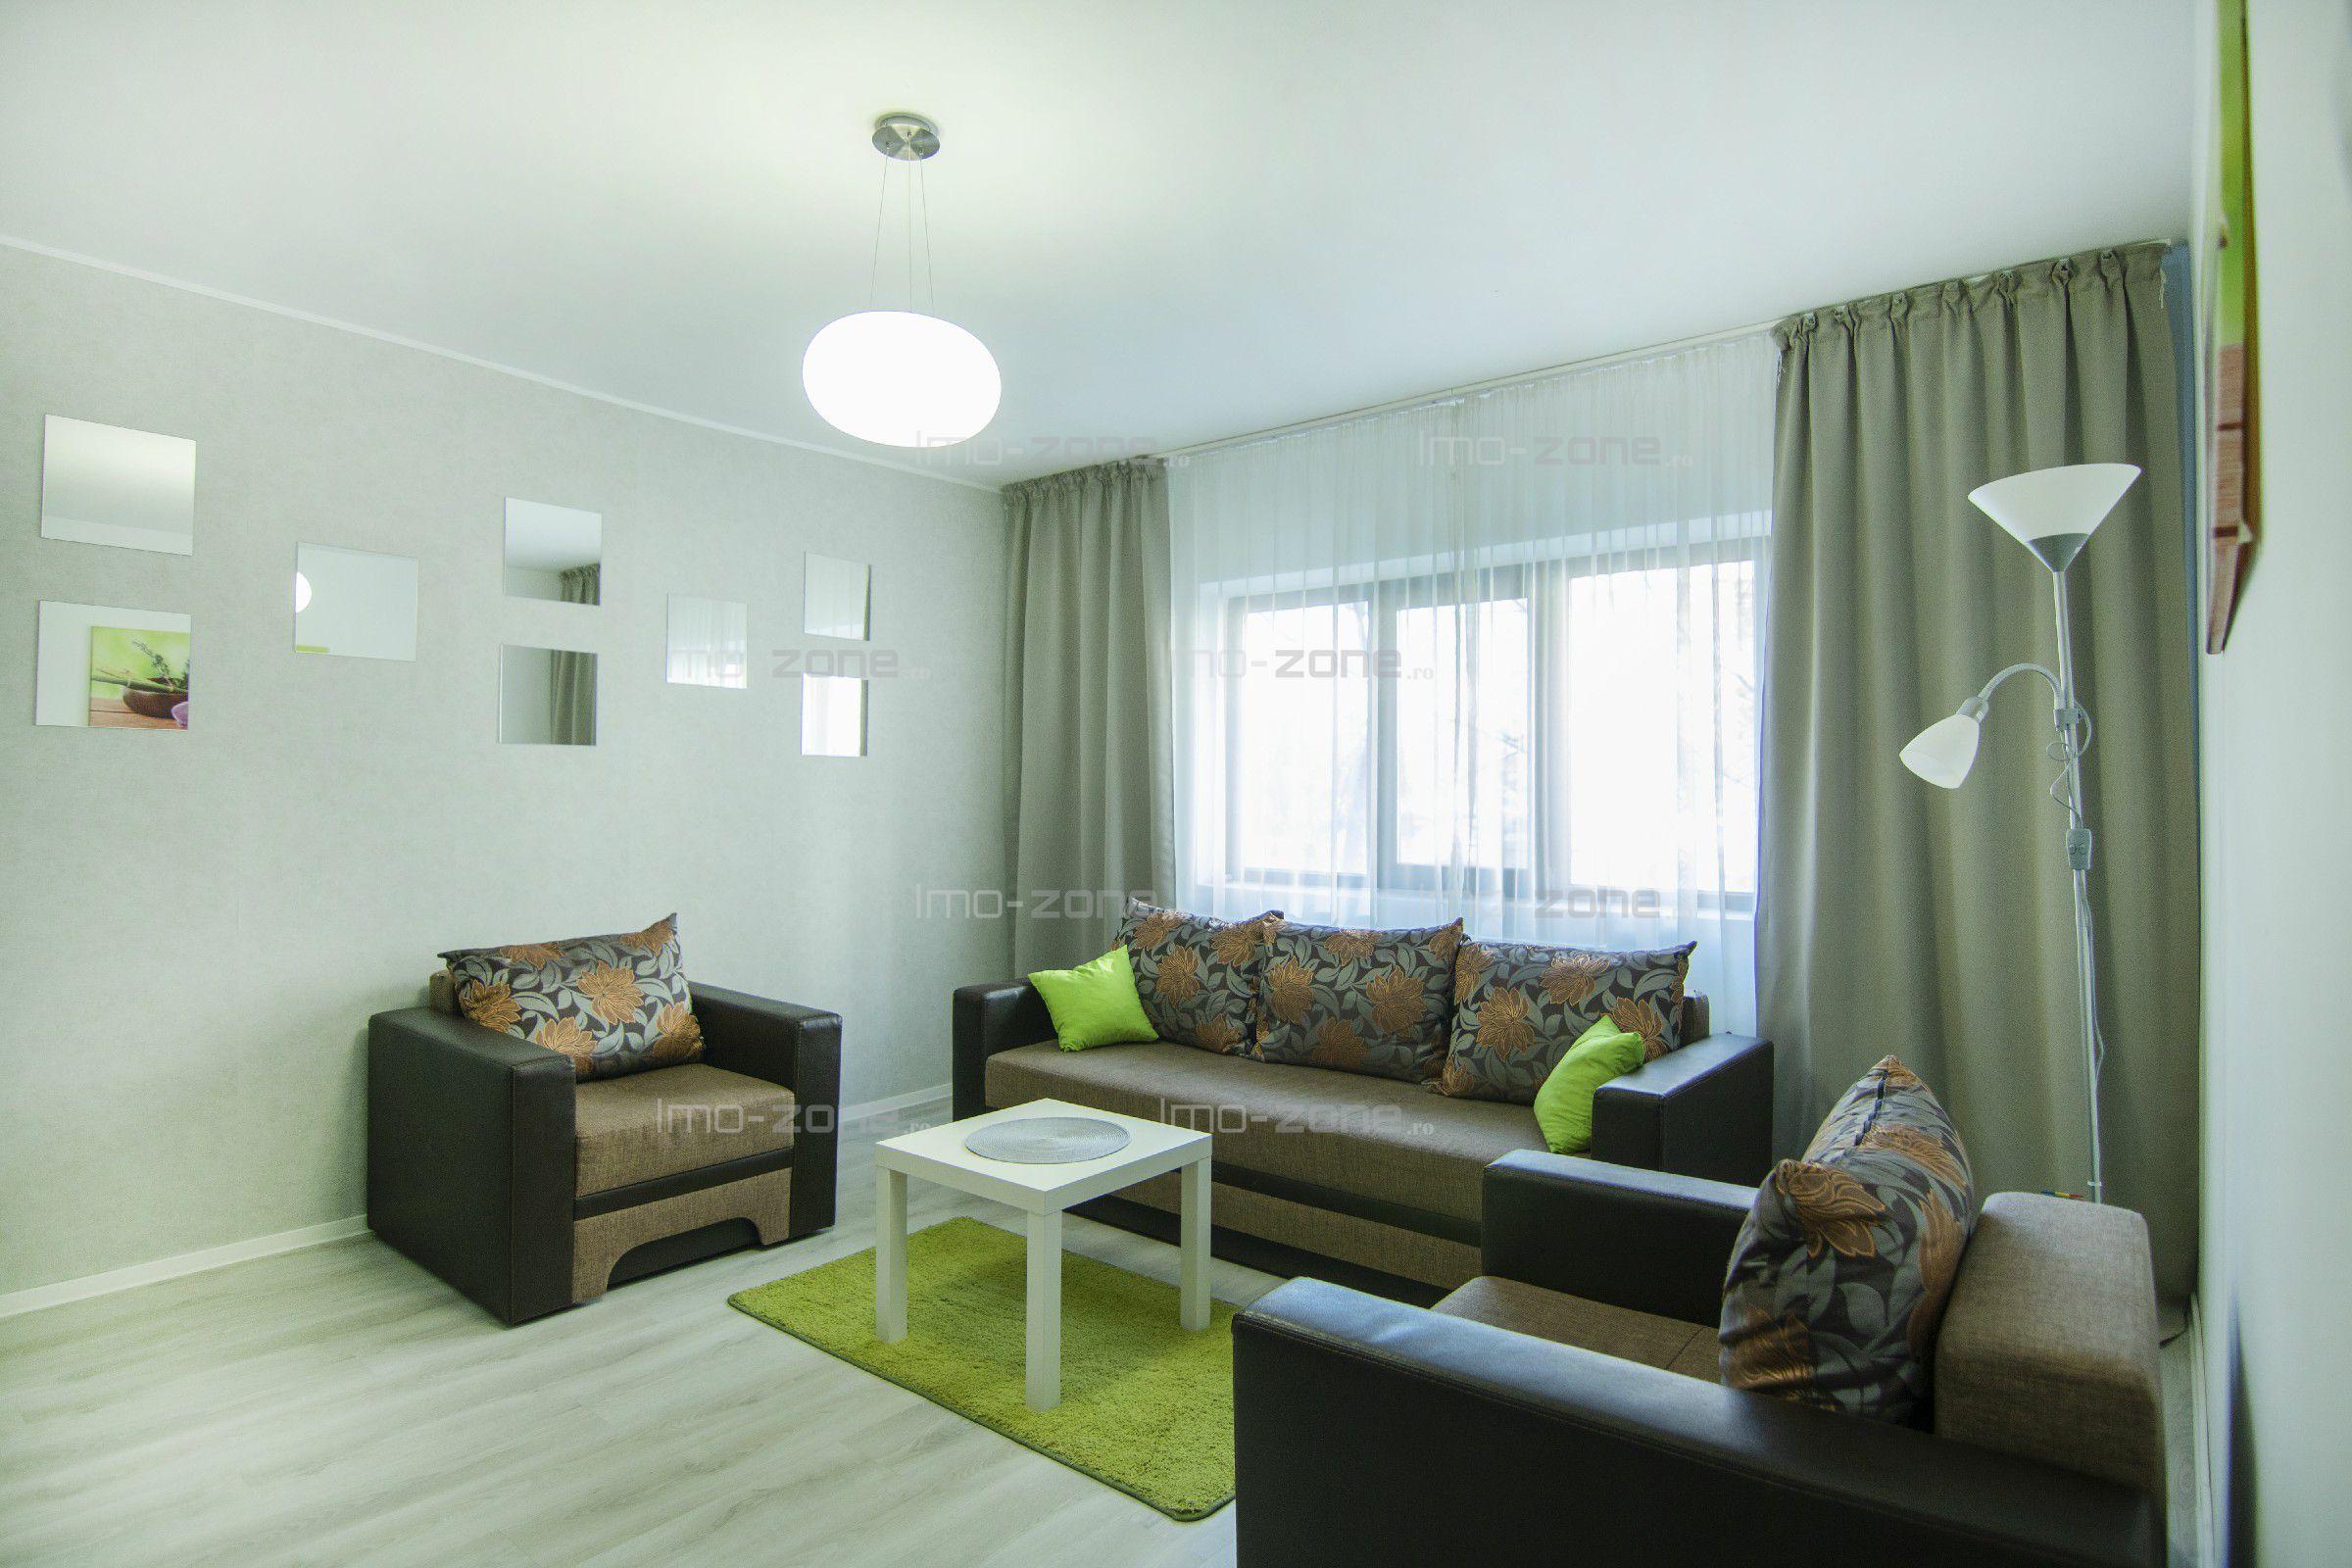 COMISION 0%, apartament cu 2 camere, decomandat, complet mobilat, geam la baie